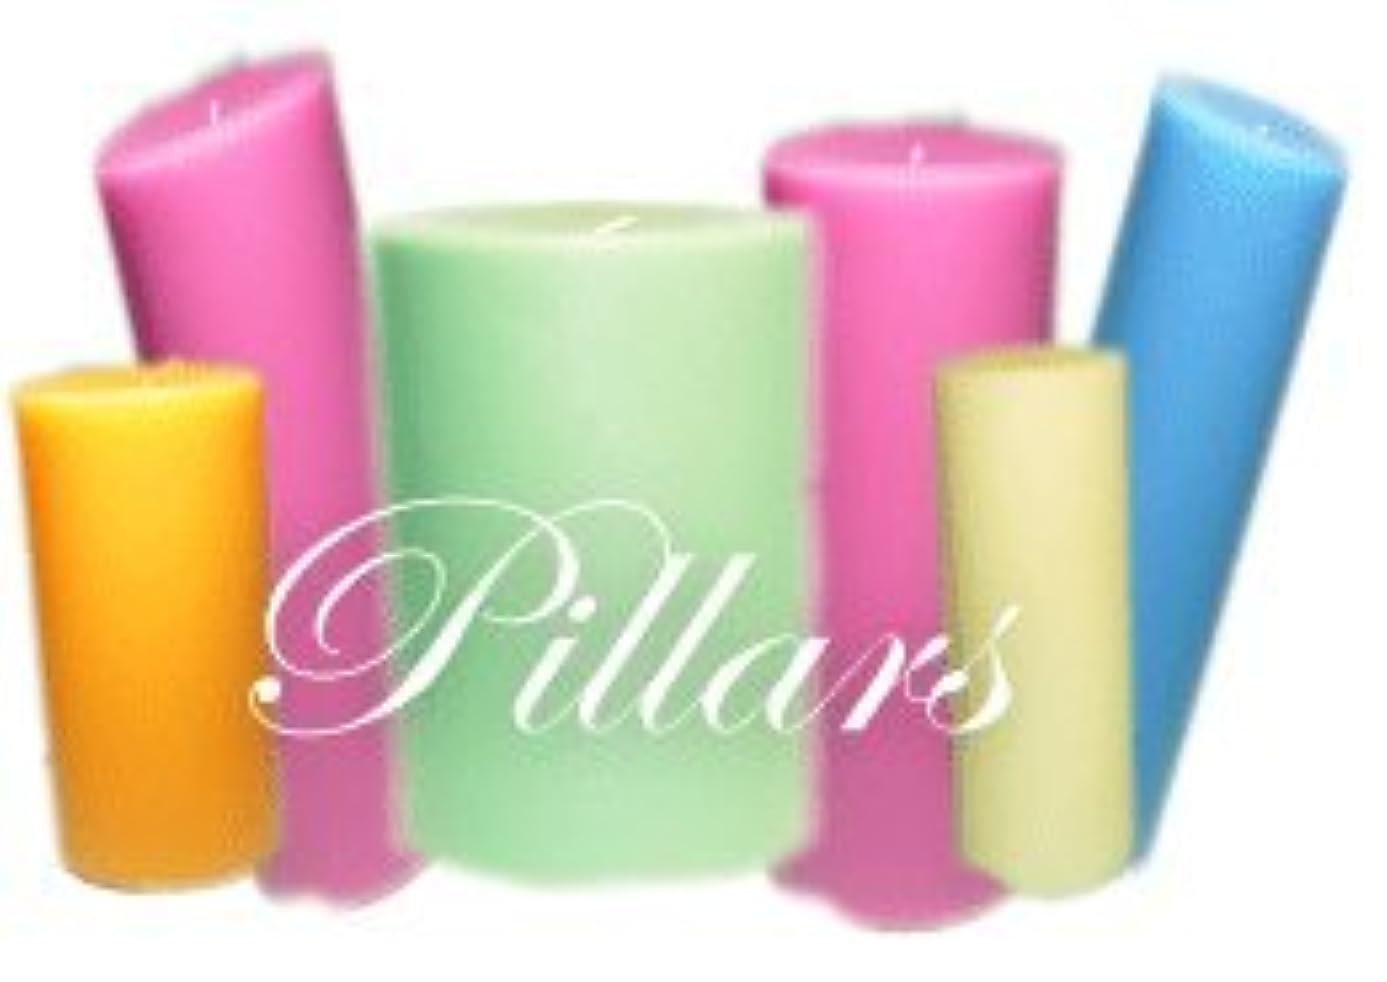 大佐石膏化粧Trinity Candle工場 – Autumn harvest – Pillar Candle – 3 x 3